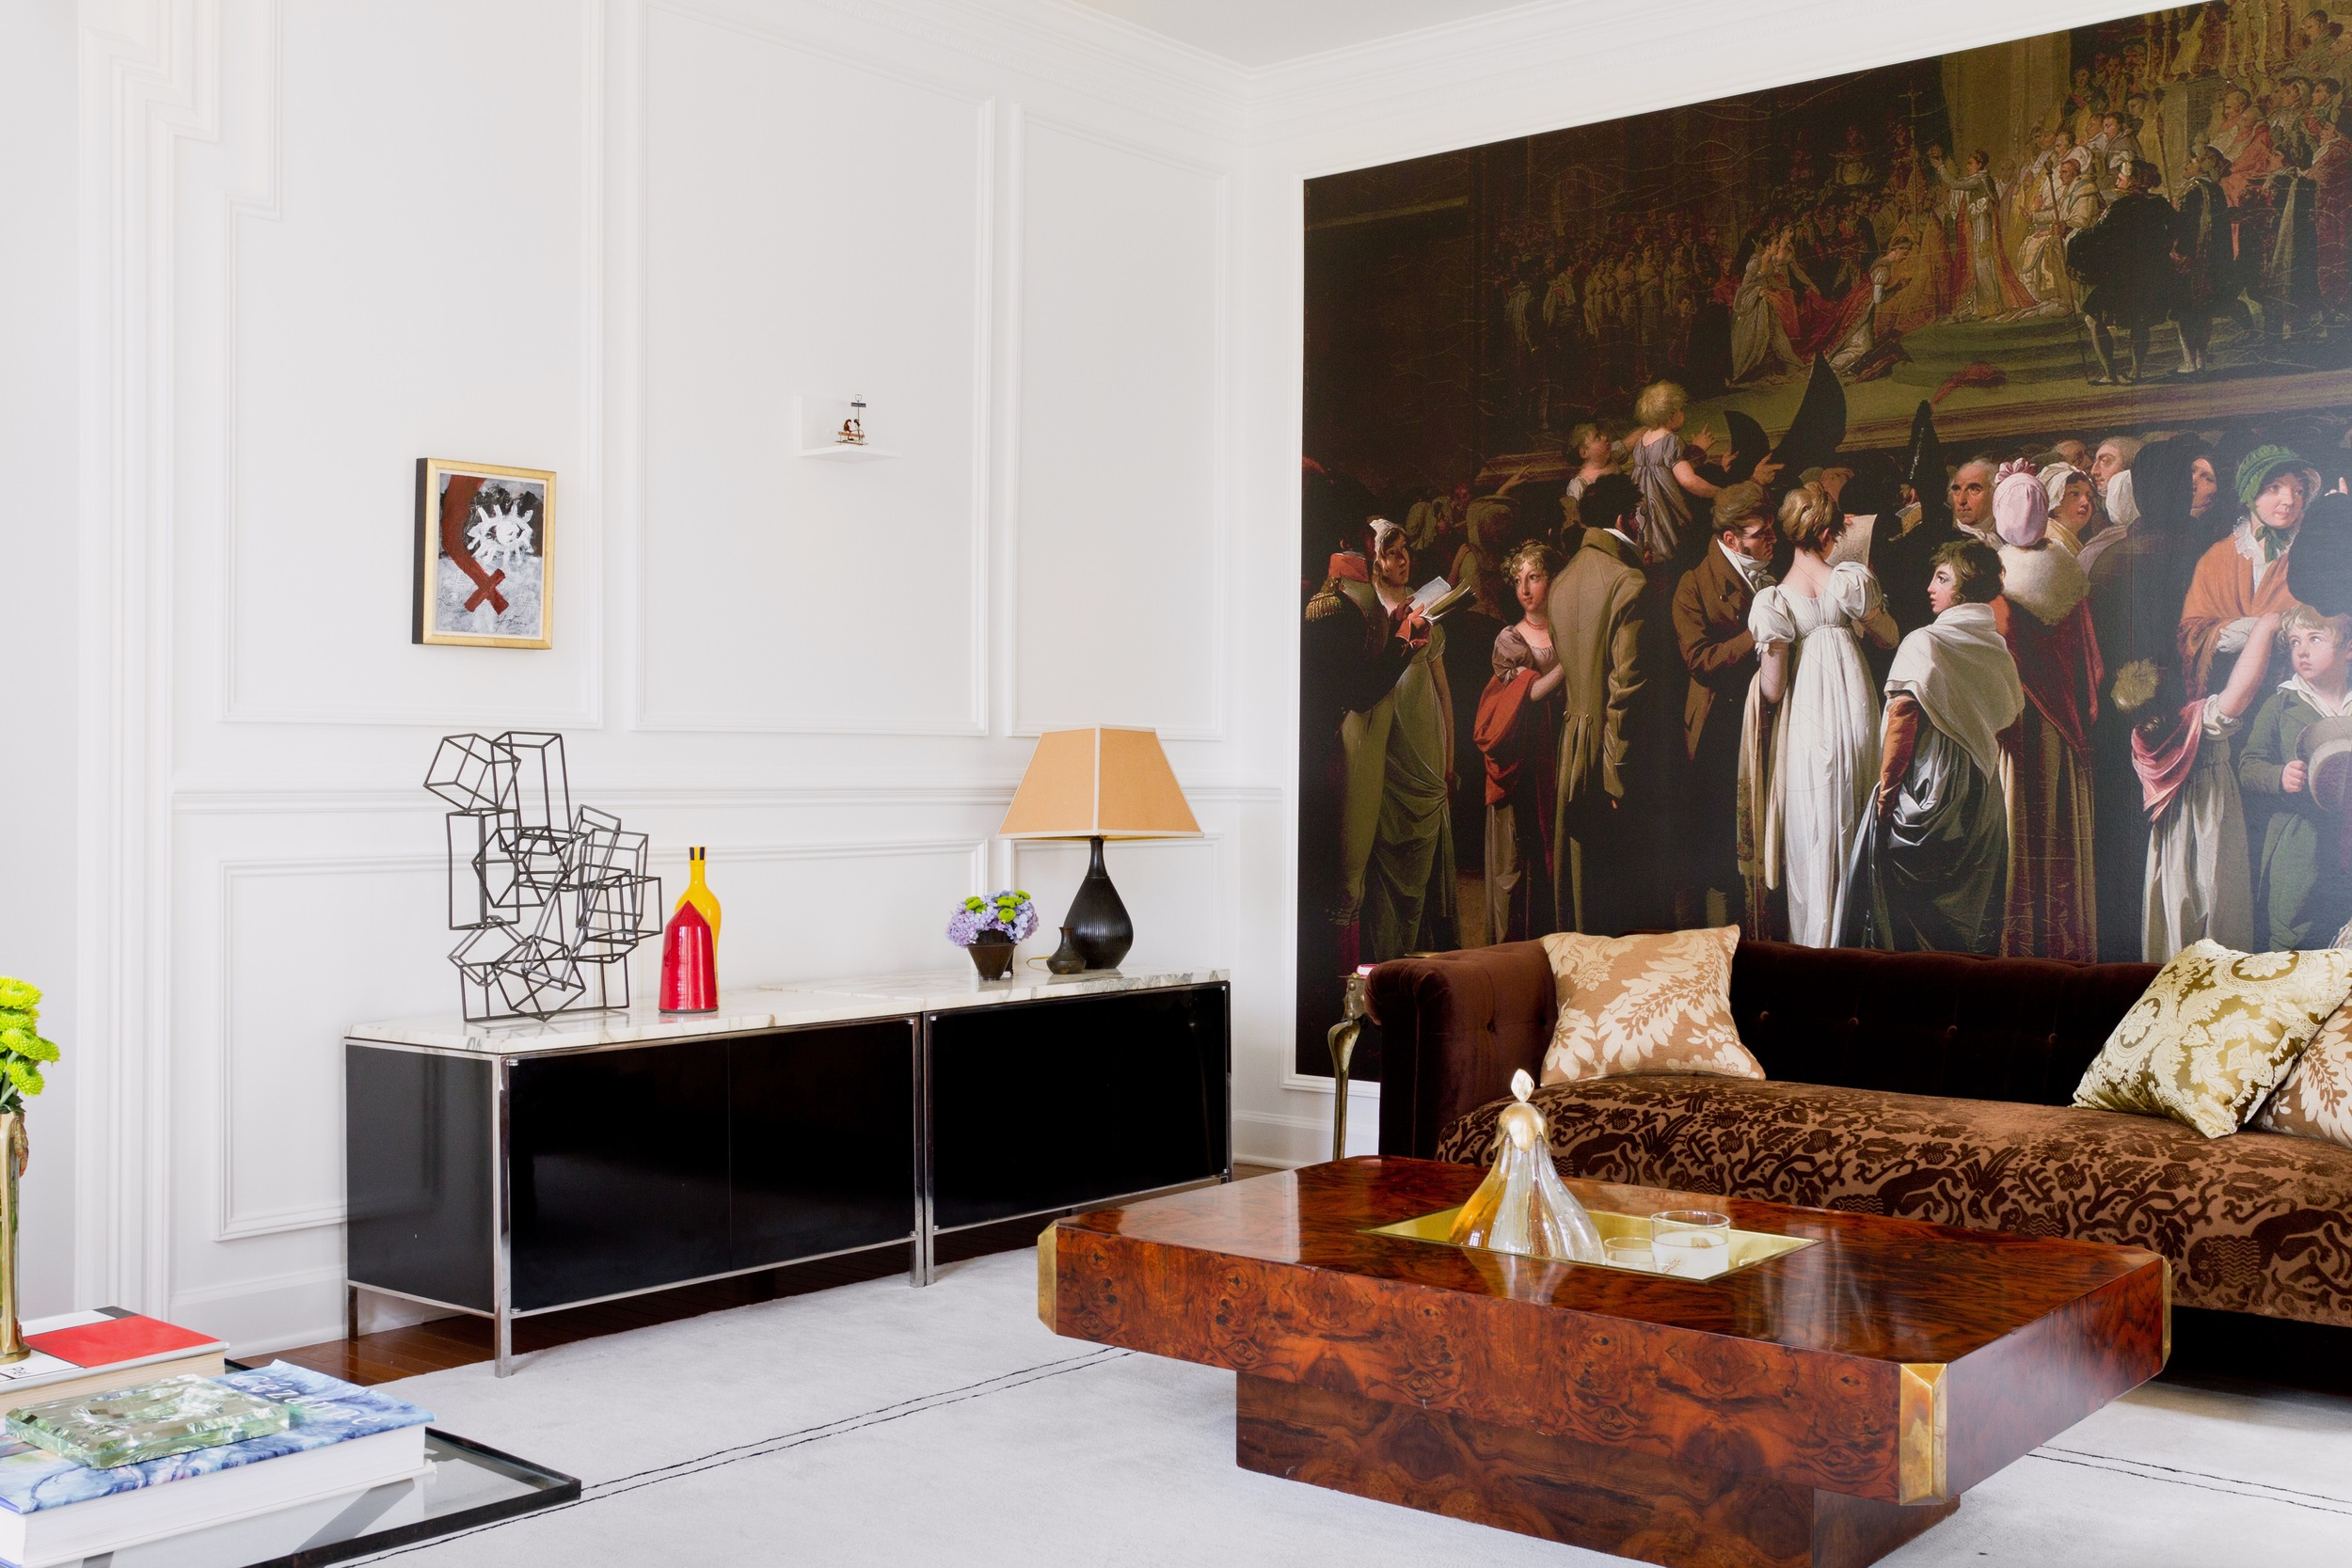 Interior by  Raji RM & Associates ; Photography by  Rikki Snyder